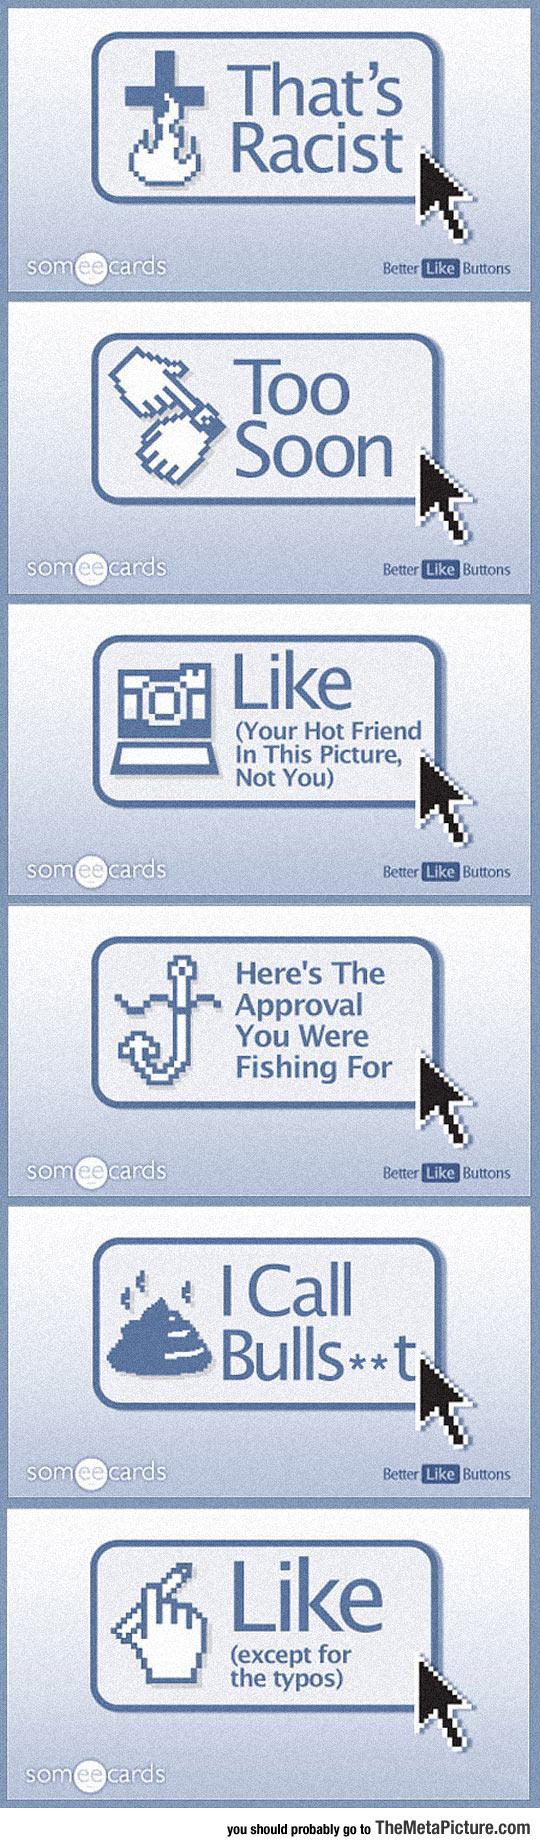 Better Buttons For Facebook